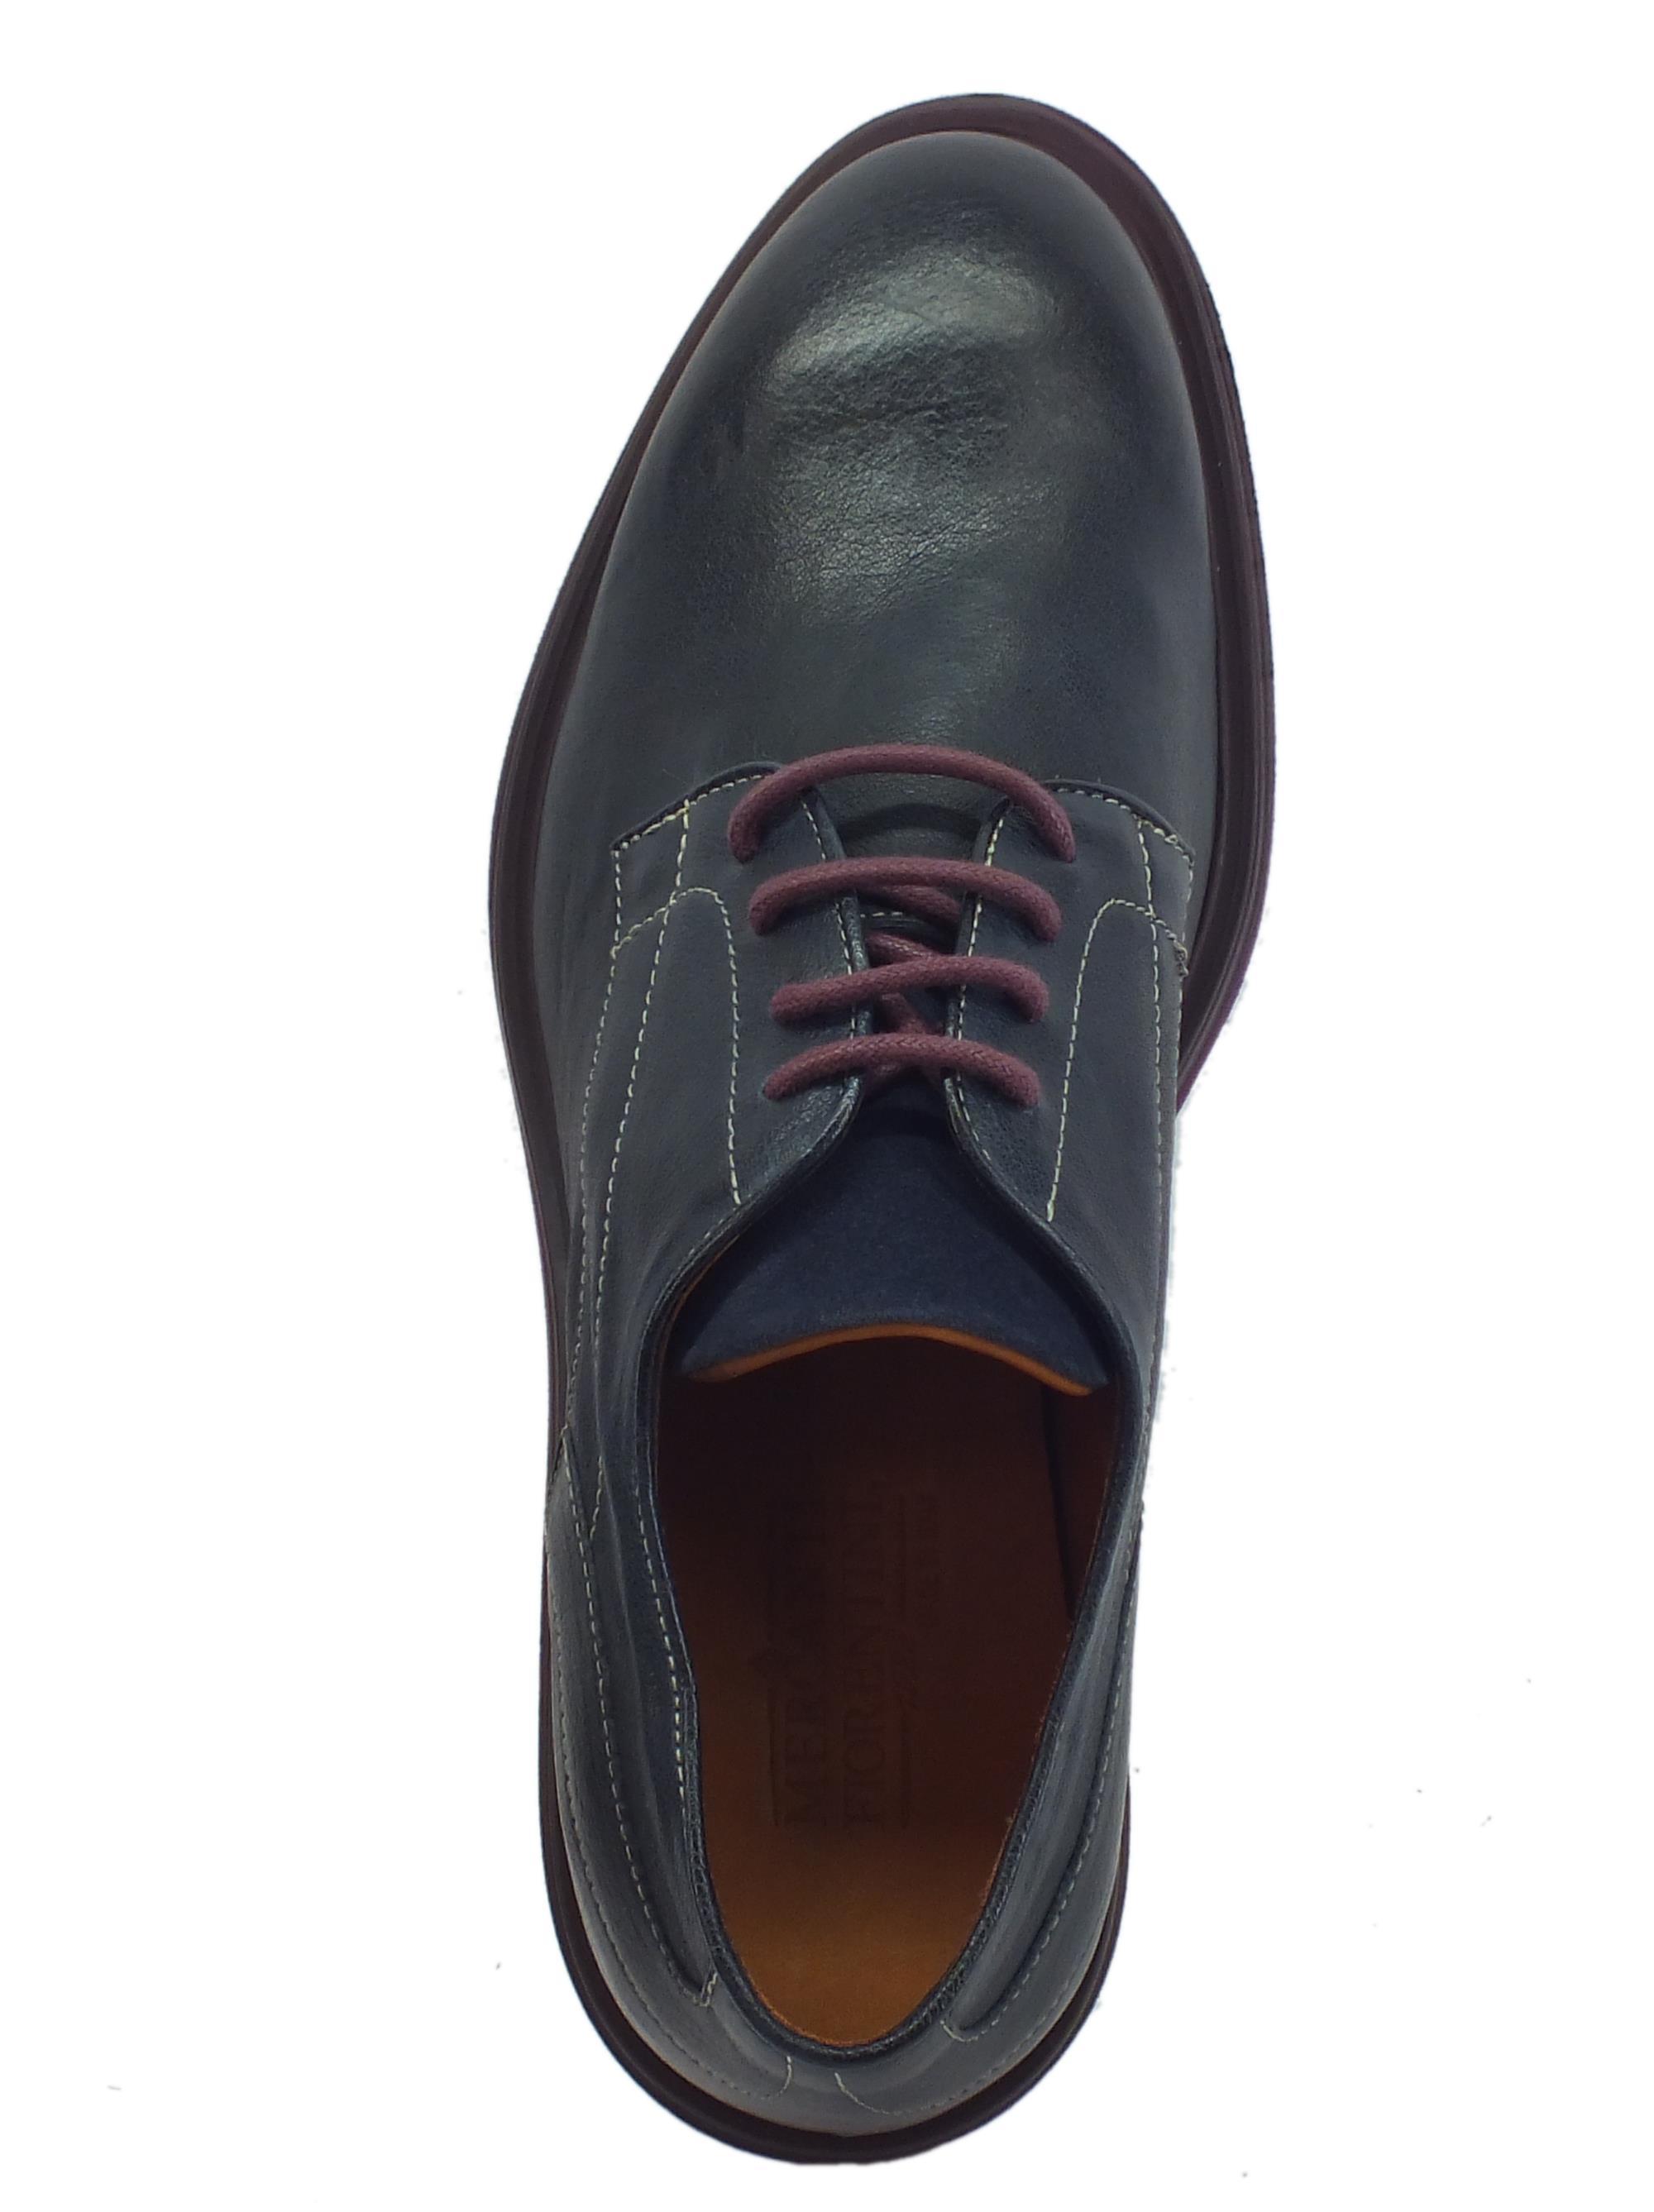 1edb8a2bd2891 ... Mercanti Fiorentini Rex Navy Kaleido Blu scarpe eleganti per uomo in  pelle blu